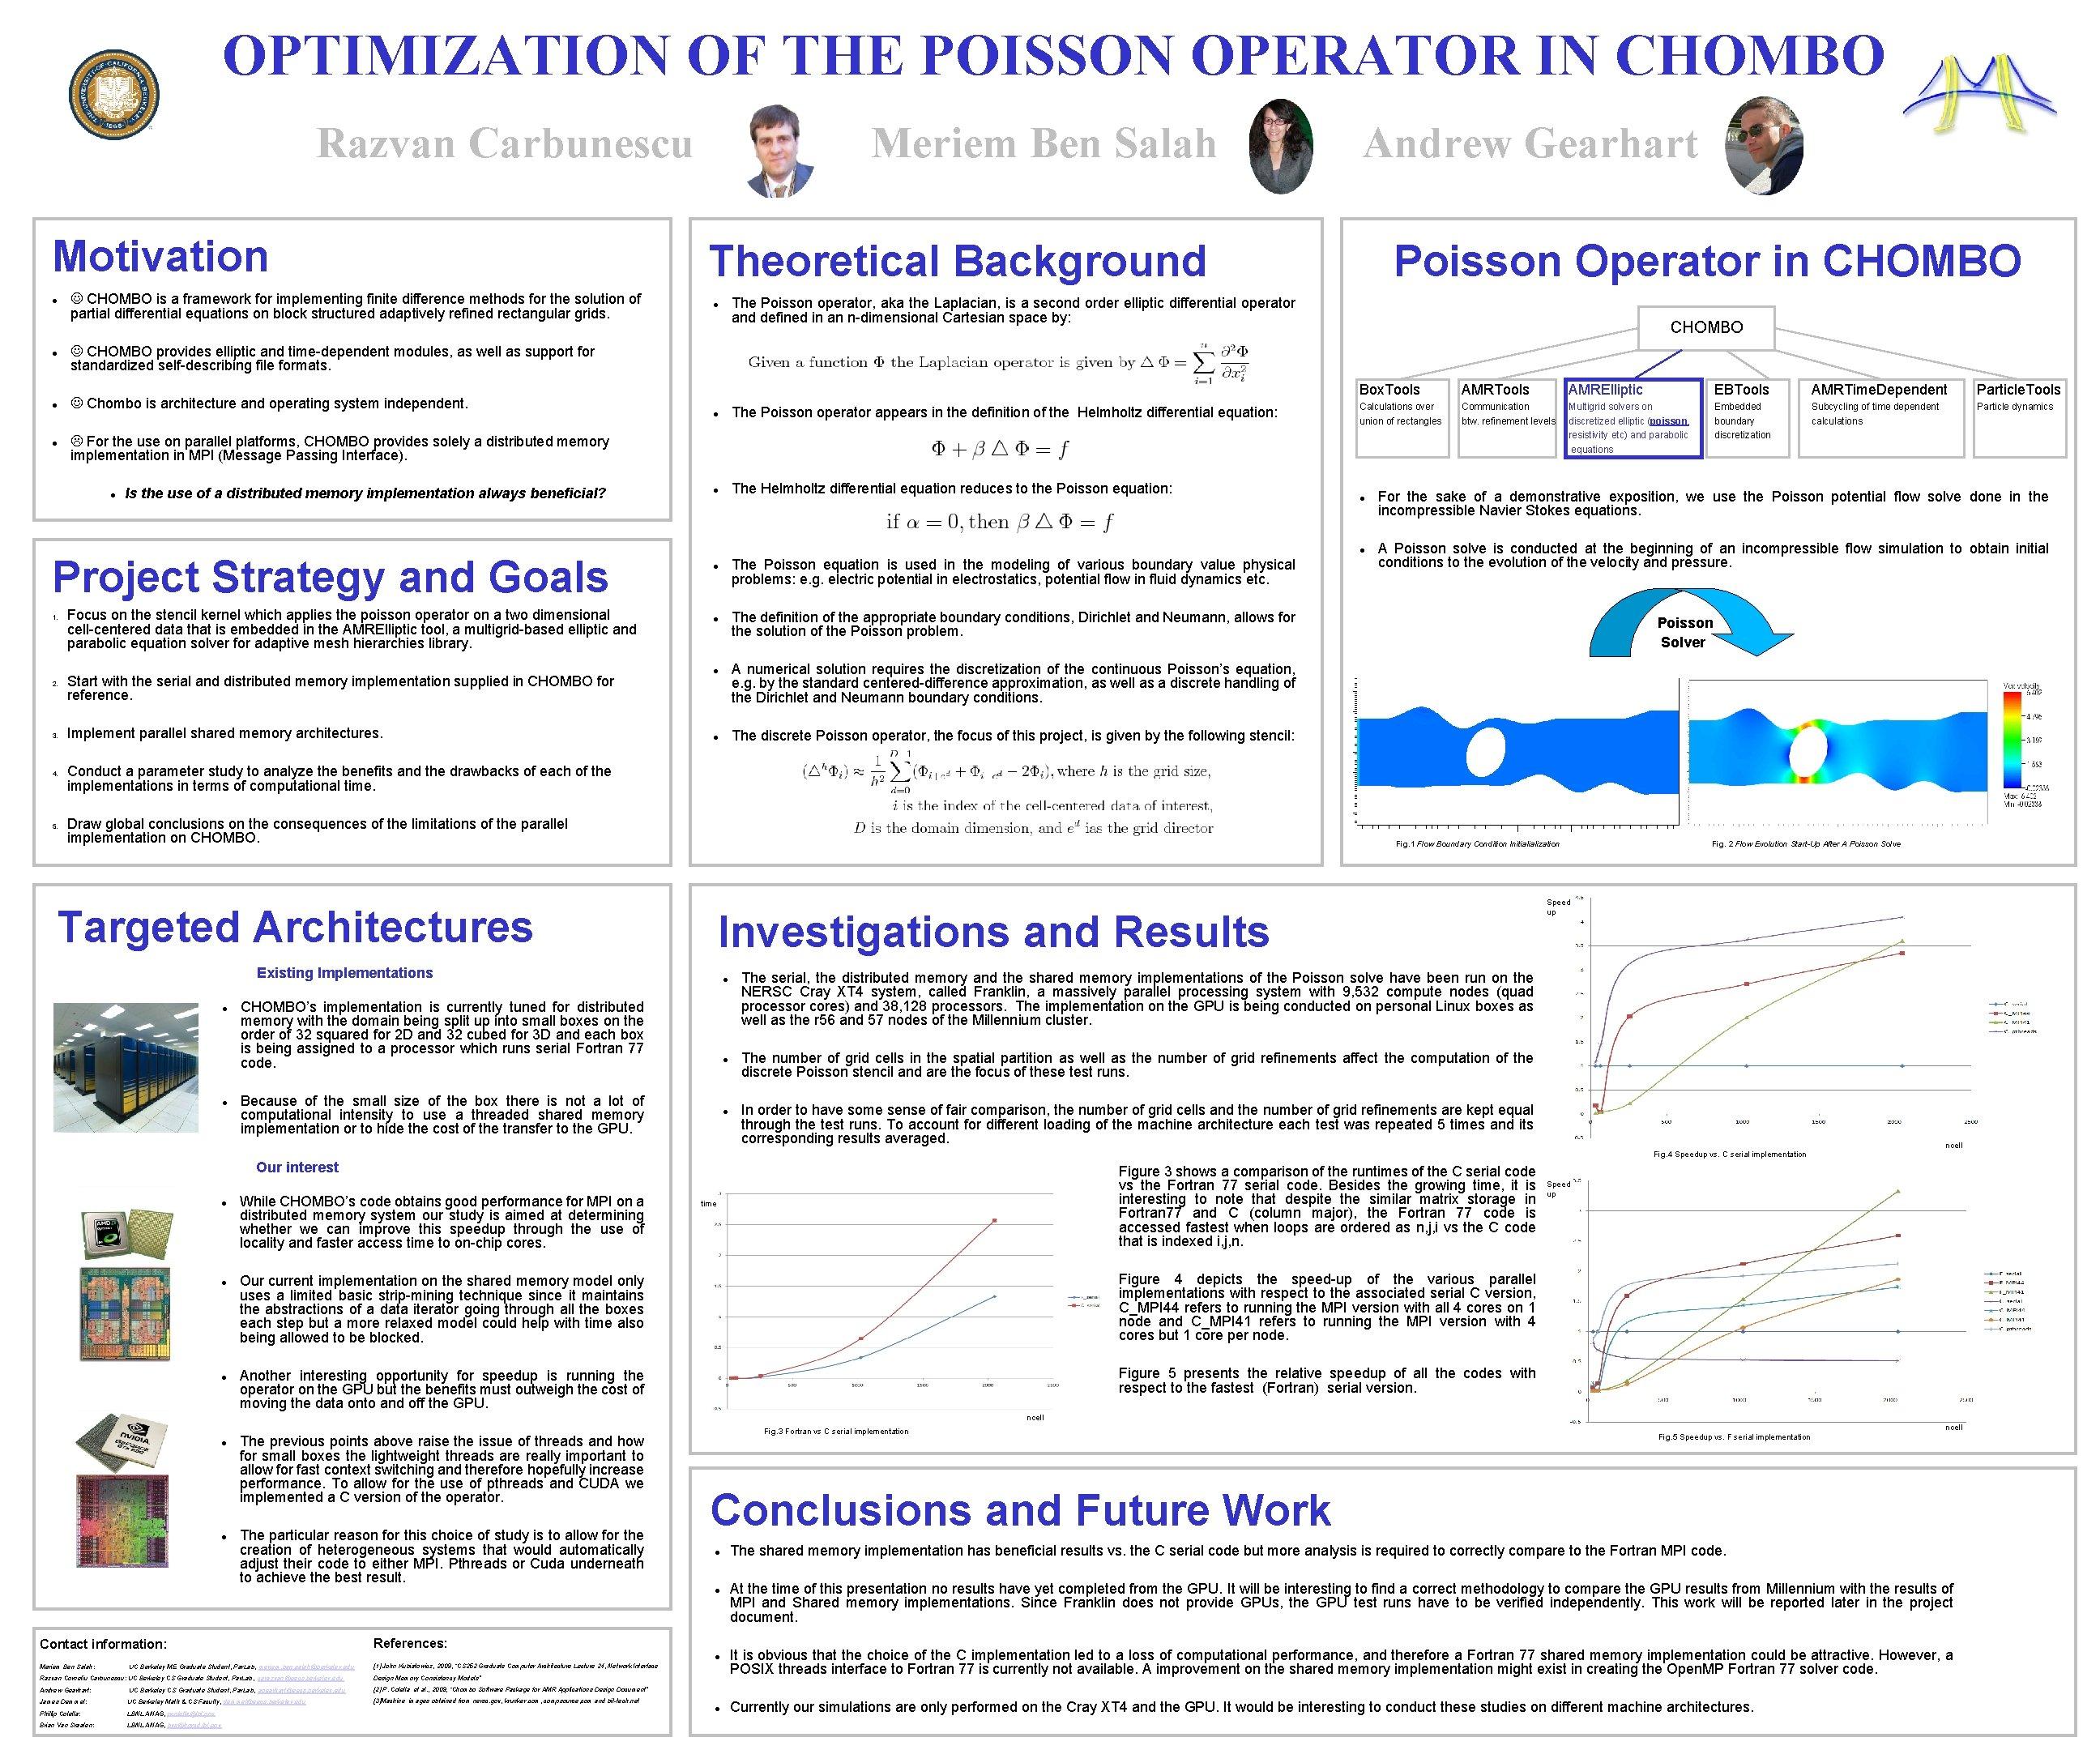 OPTIMIZATION OF THE POISSON OPERATOR IN CHOMBO Razvan Carbunescu Motivation 3. 4. 5. Poisson